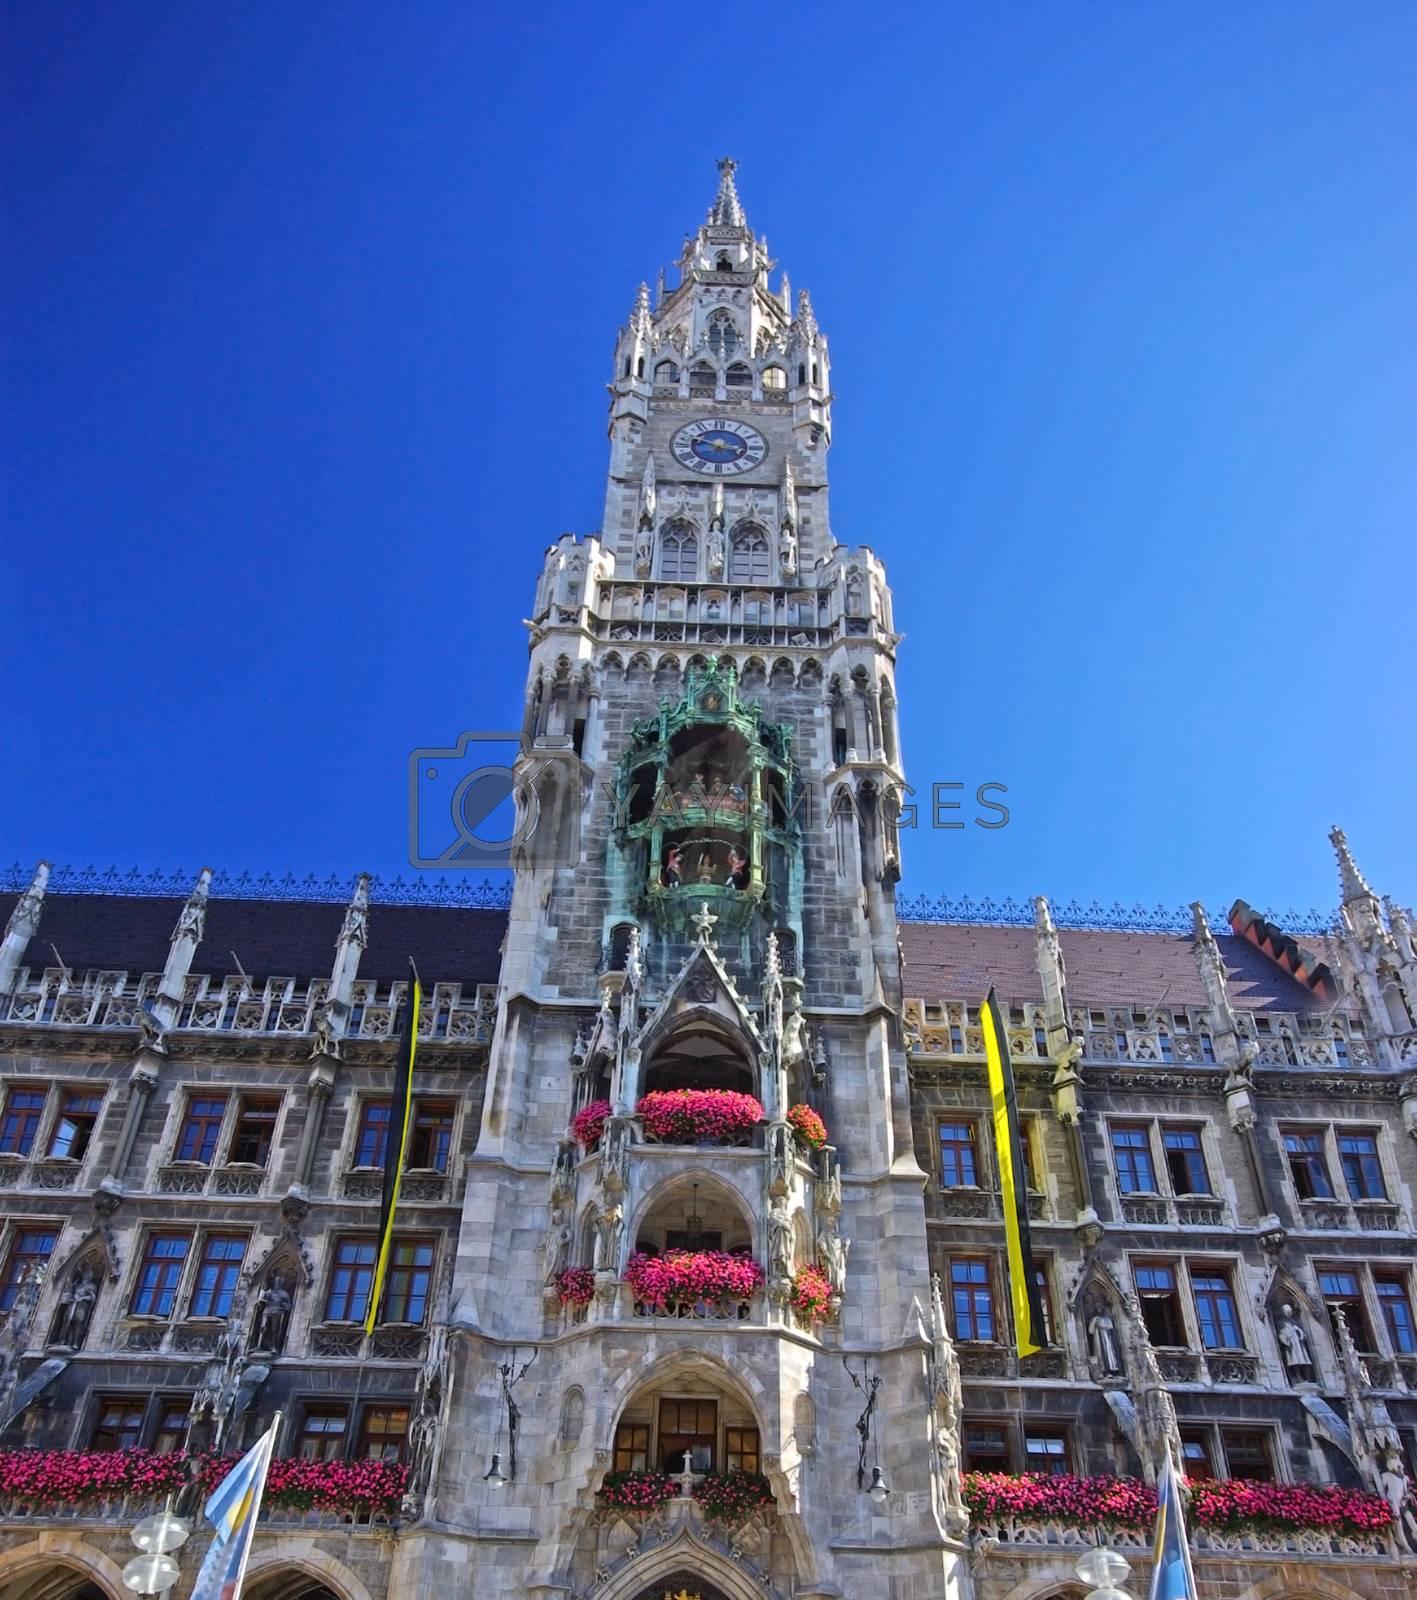 Beautiful tower of town hall in Munich, Germany (Marienplatz).